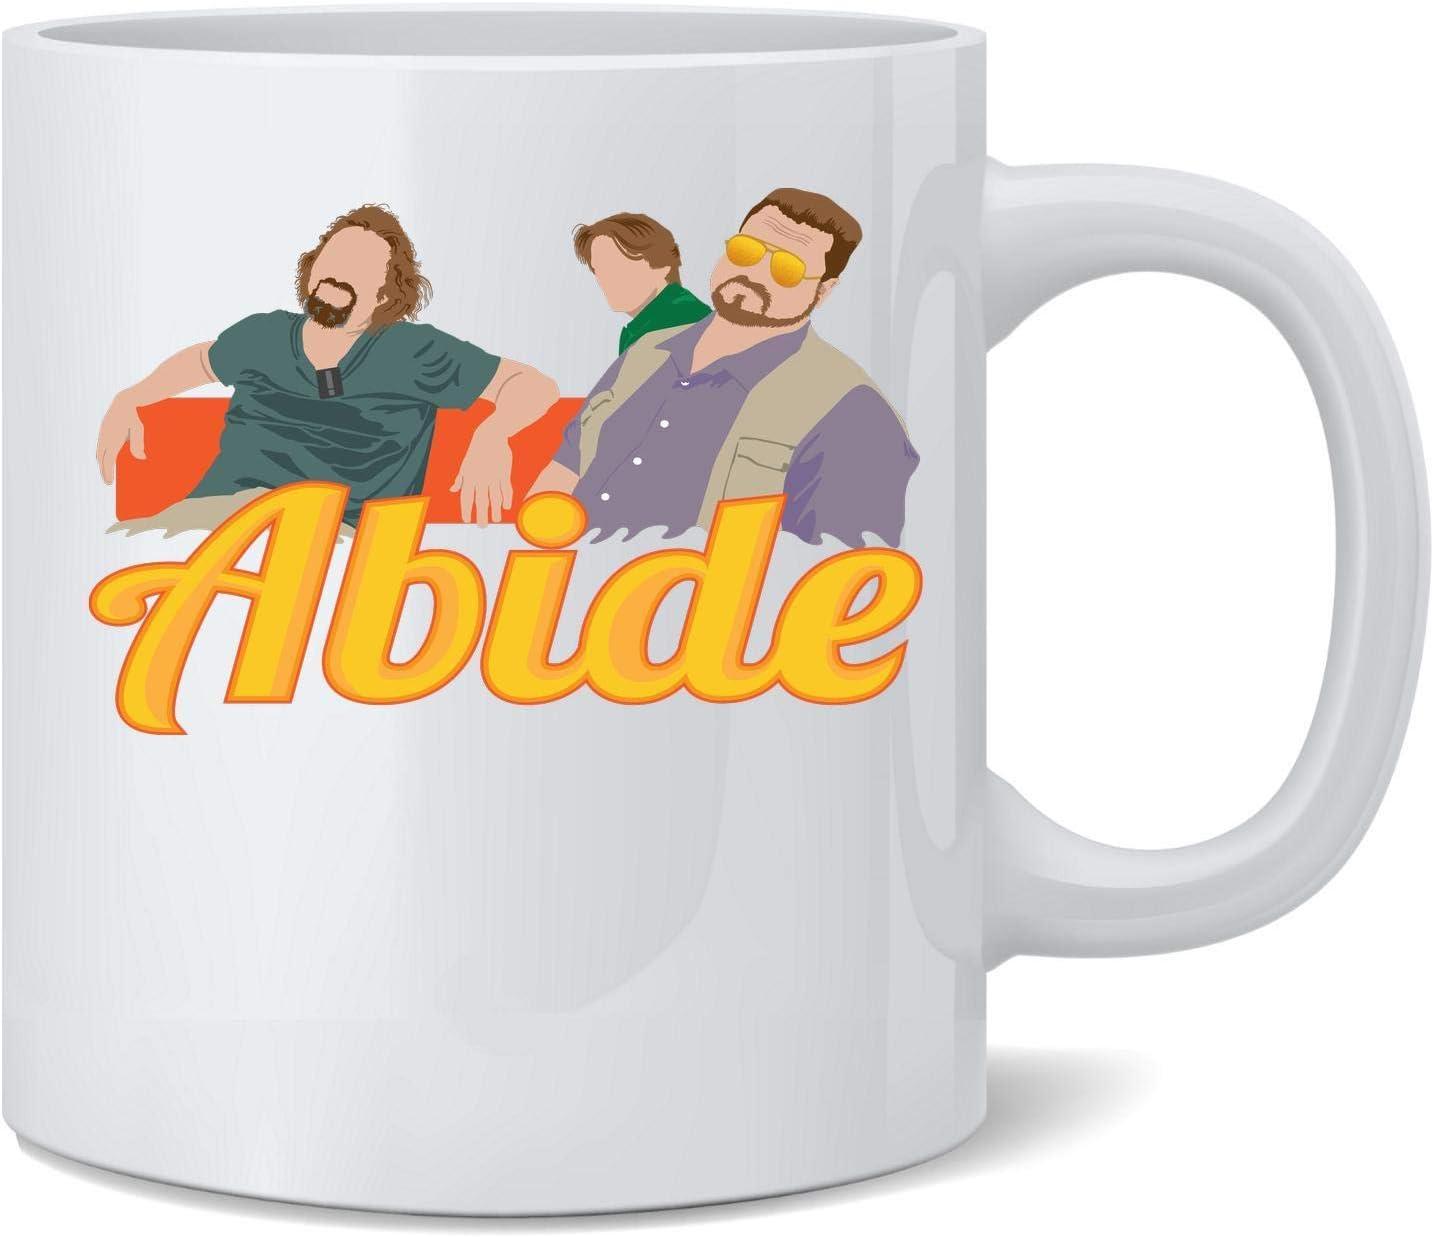 Poster Foundry The Dude Abides Minimalist Ceramic Coffee Mug Tea Cup Fun Novelty Gift 12 oz